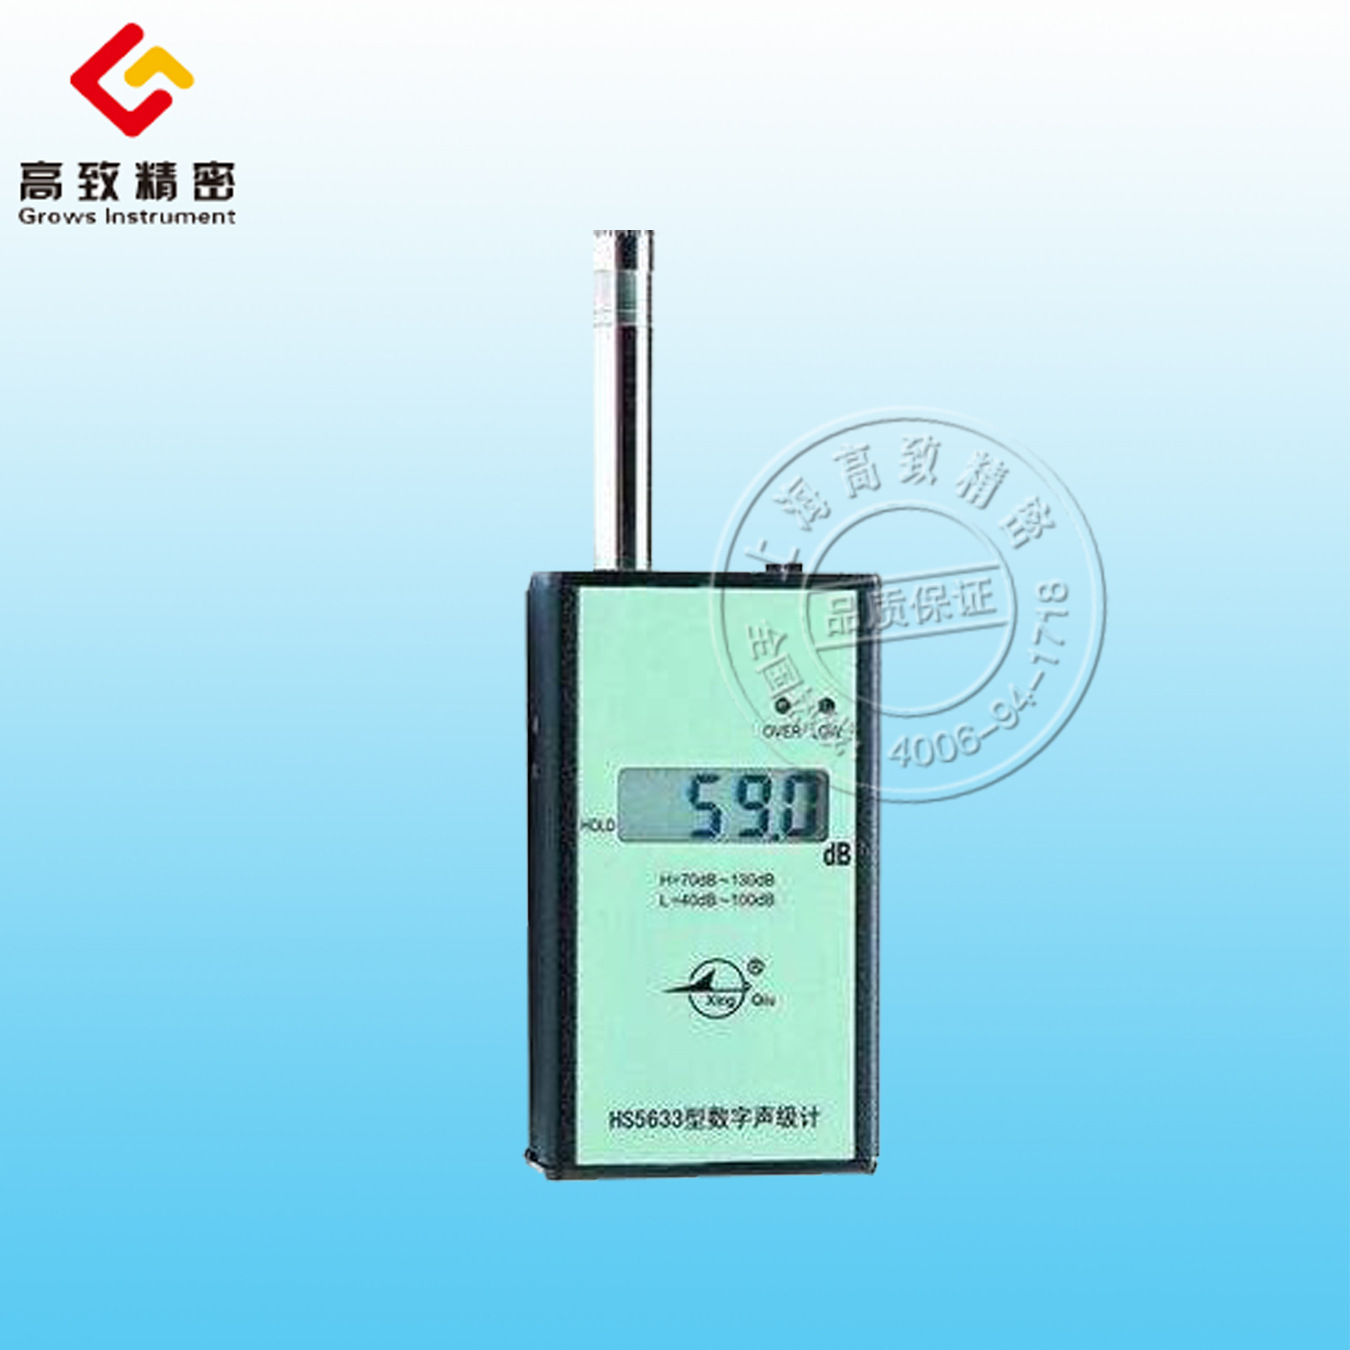 HS5633型噪声监测仪 Grows/高致精密